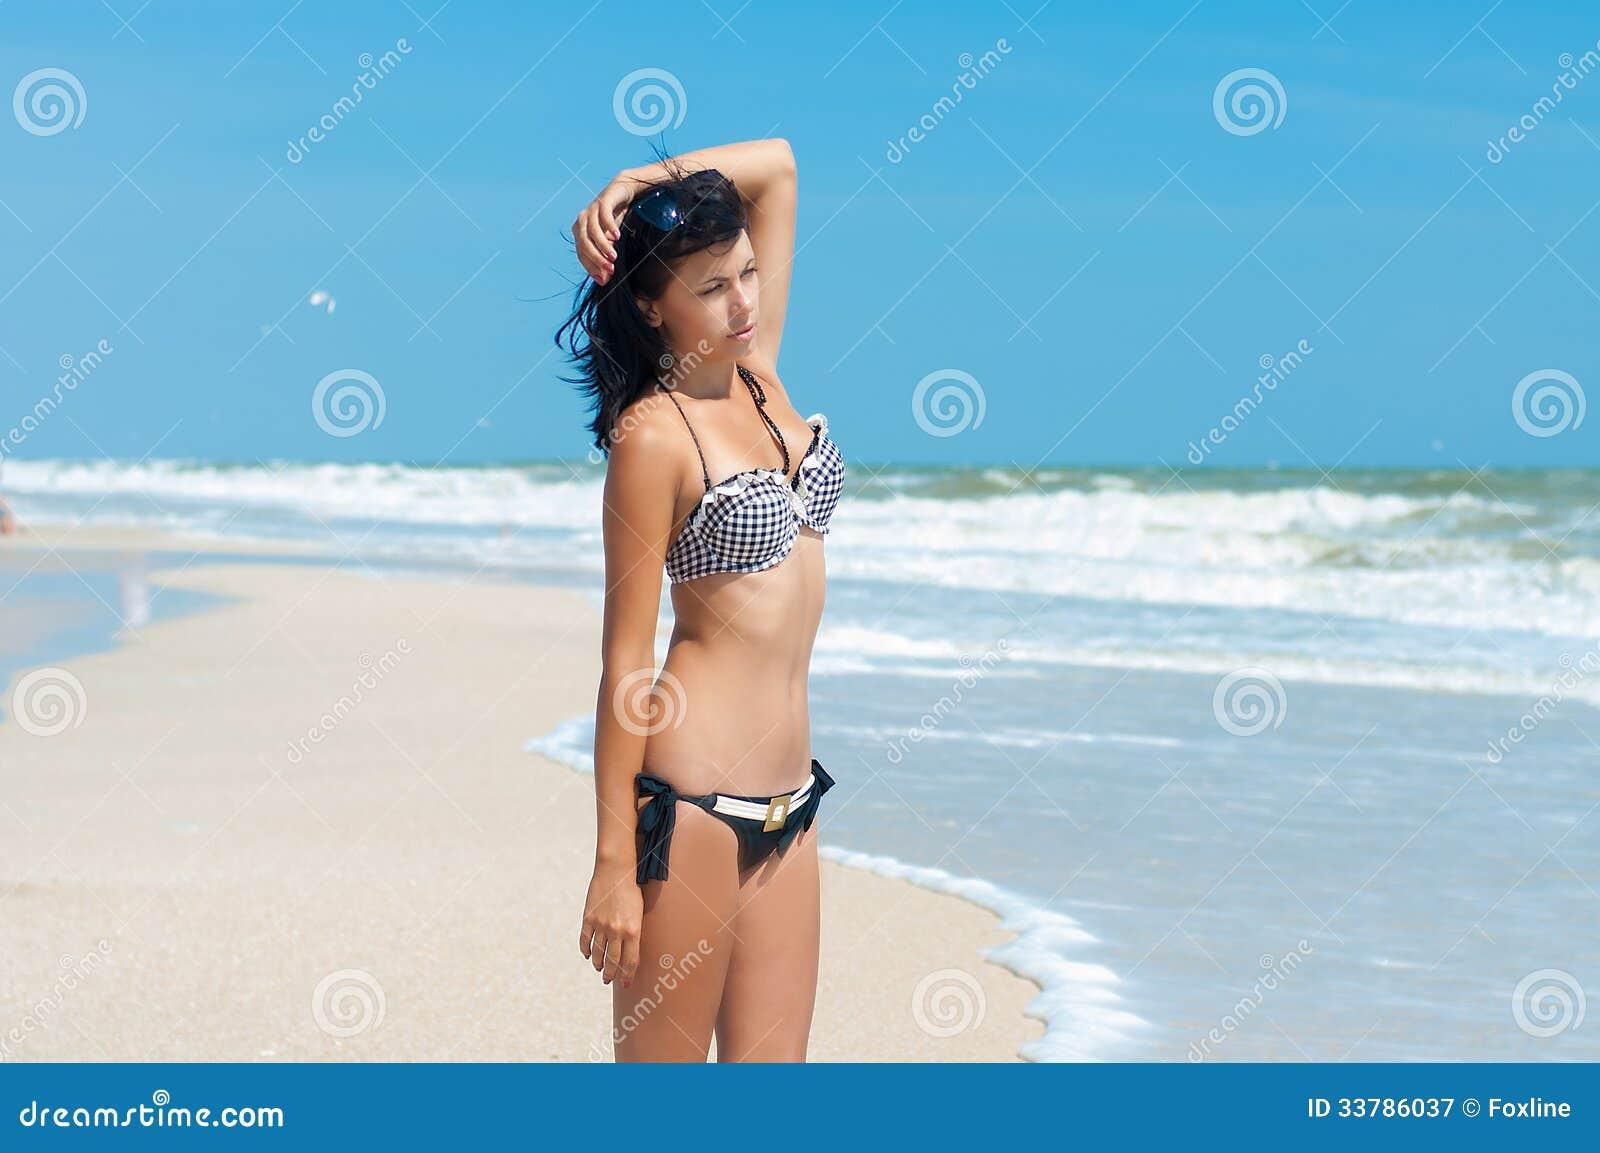 Les plus belles filles en bikini en 2014 by Splash News